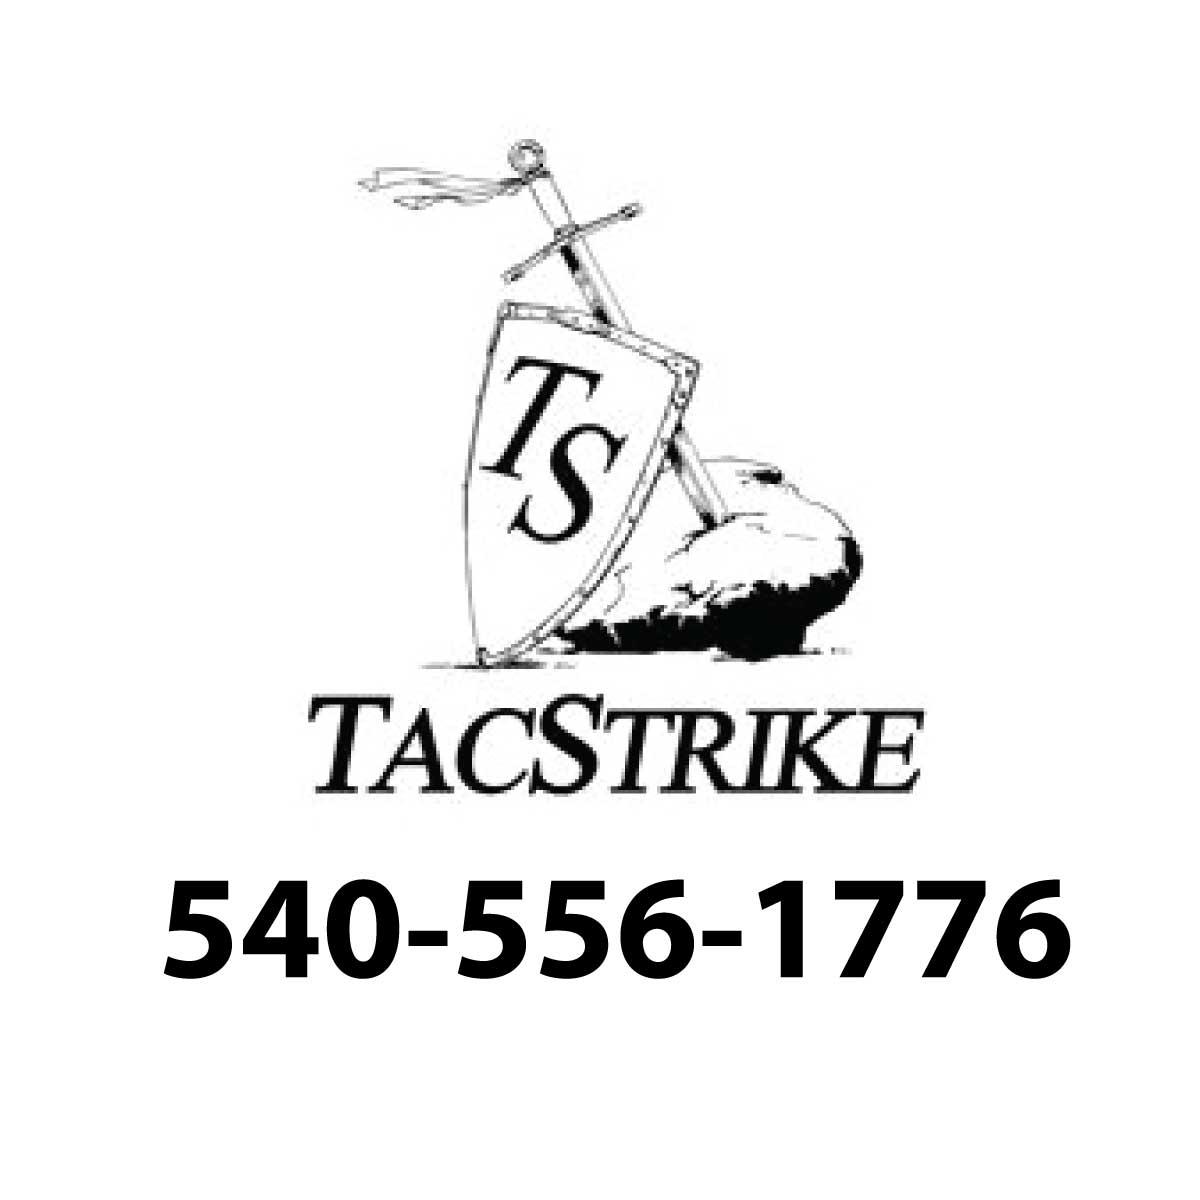 TacStrike